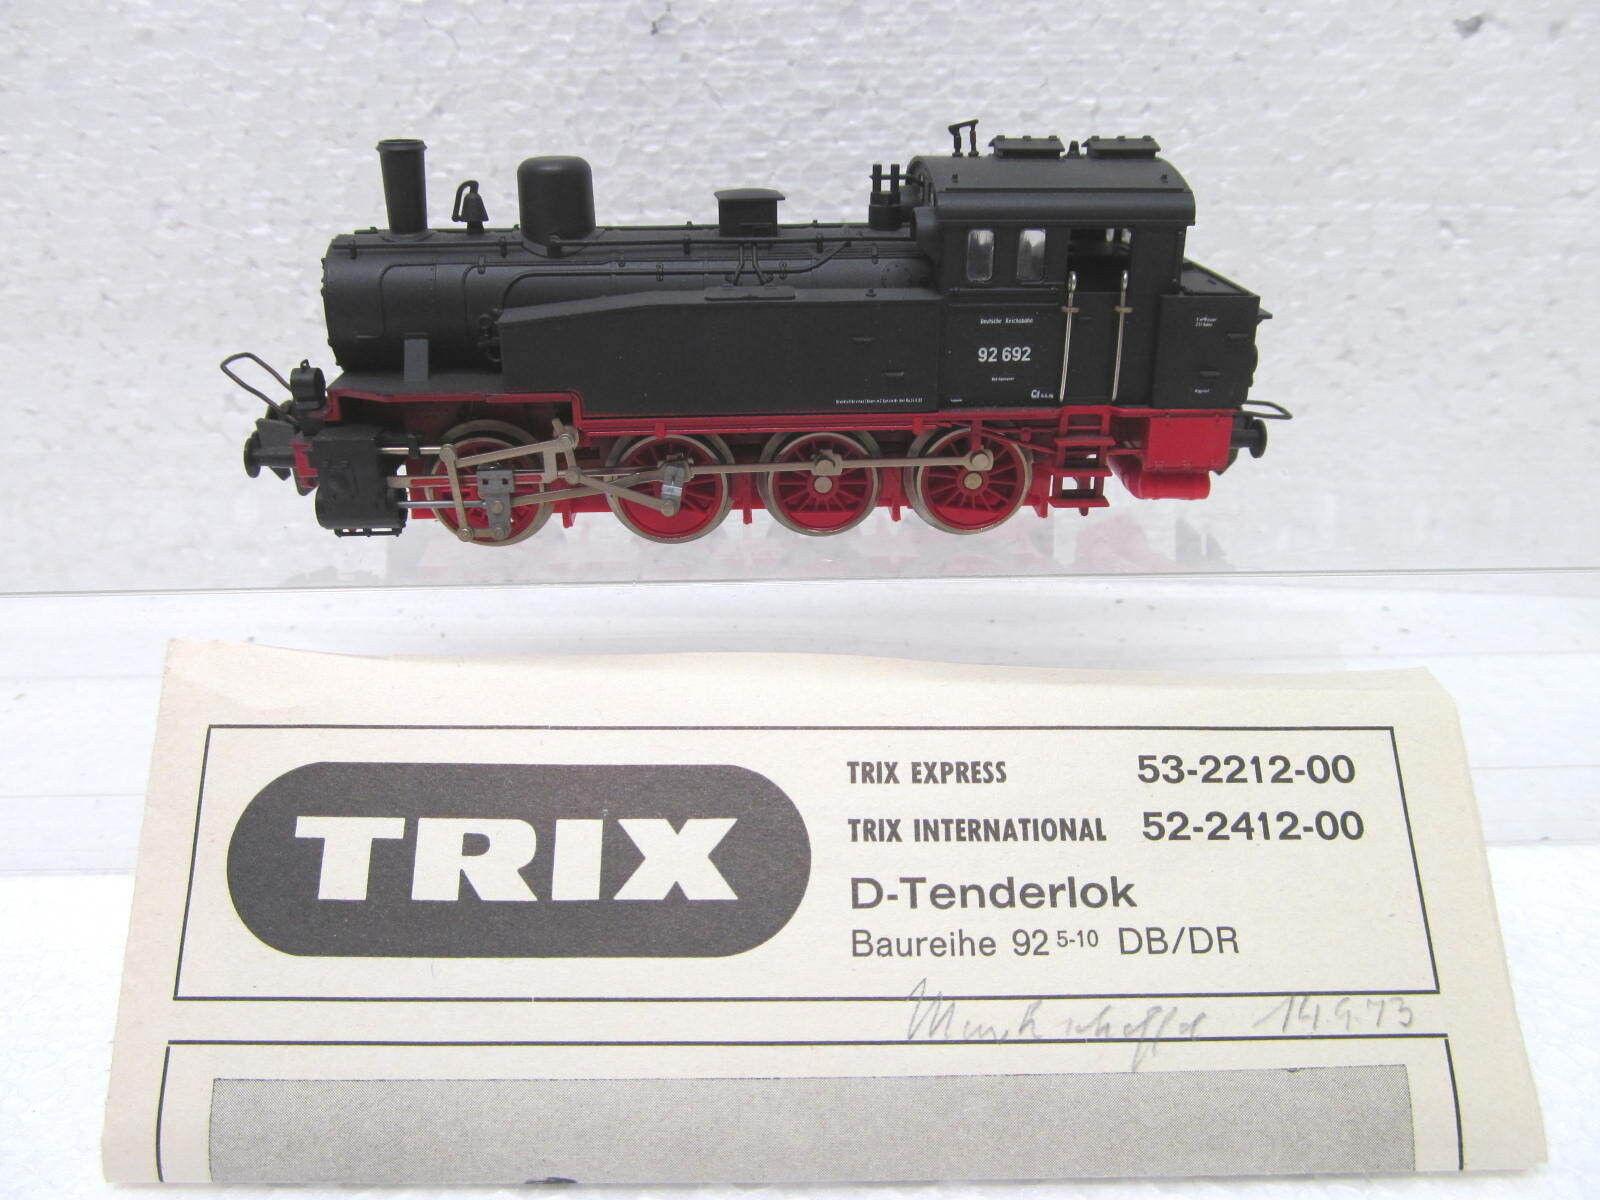 Mes-39750 Trix internally. 52-2412-00 h0 Steam Locomotive DRG 92 692 very good condition,